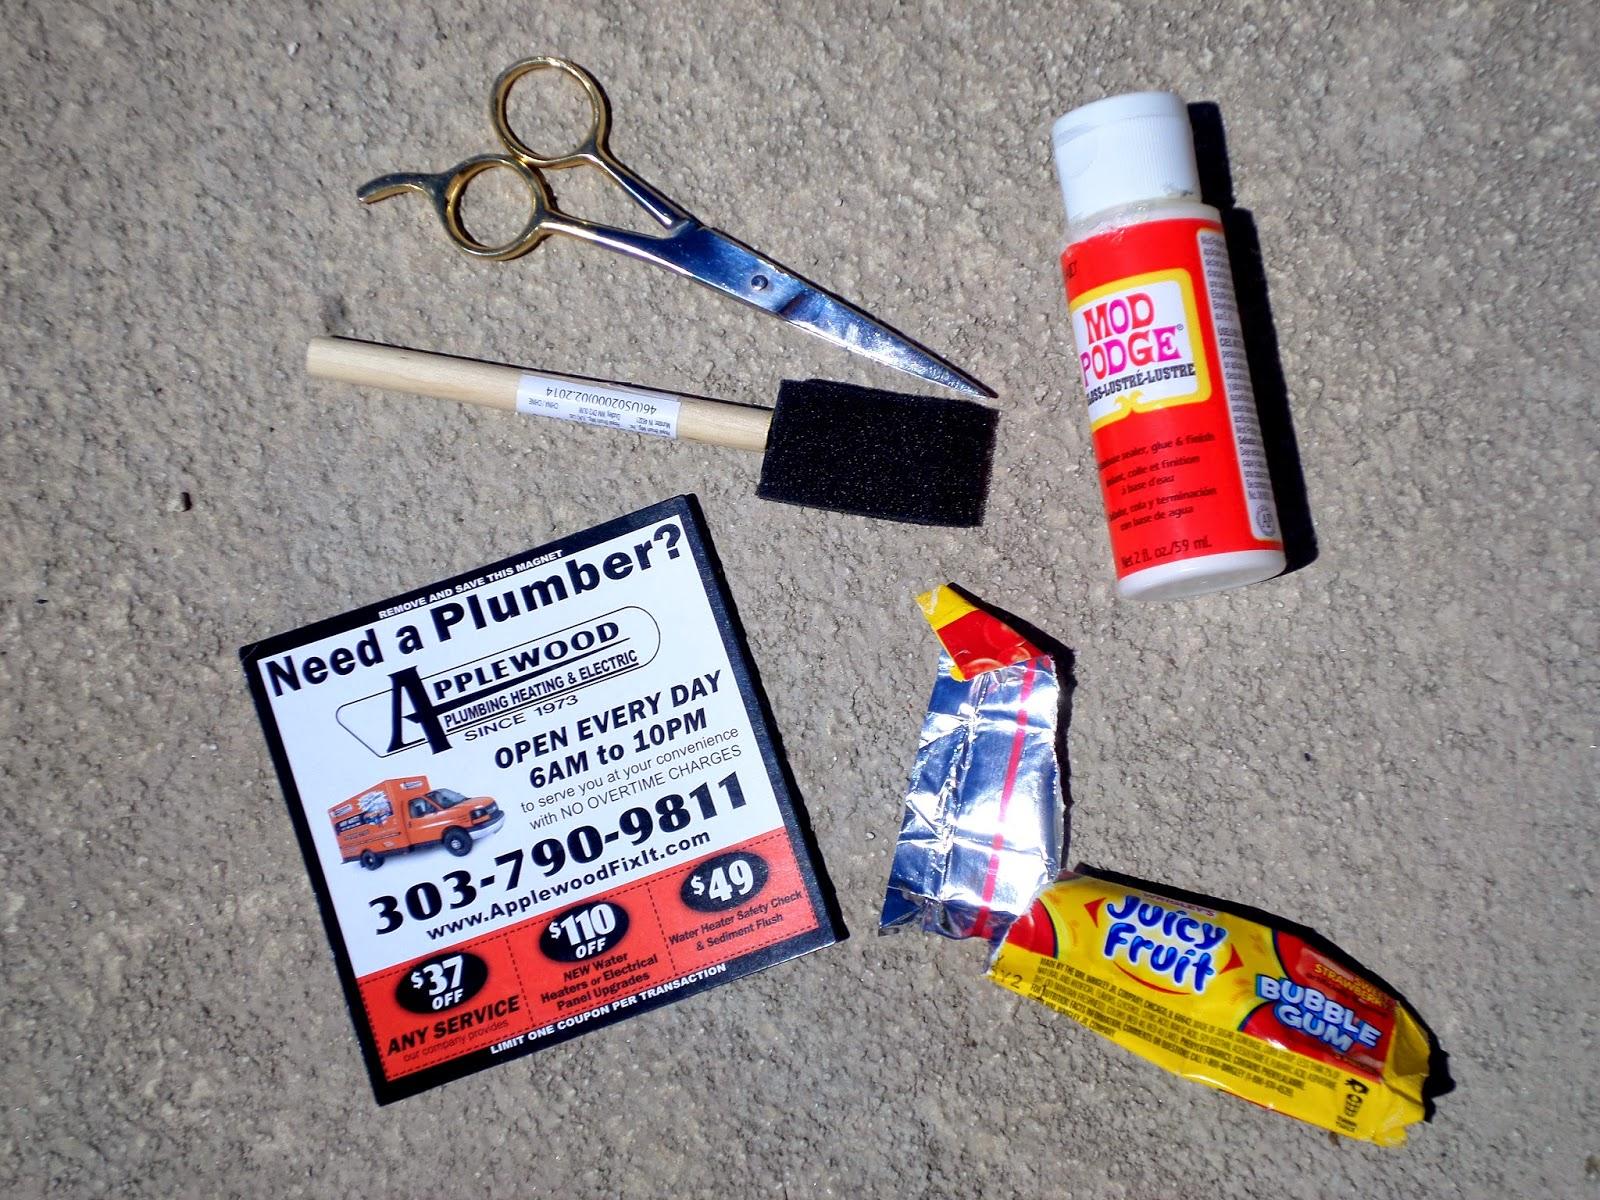 Summer Fun Juicy Fruit Gum Upcycled Wrapper Magnet Supplies #JuicyFruitFunSide #shop